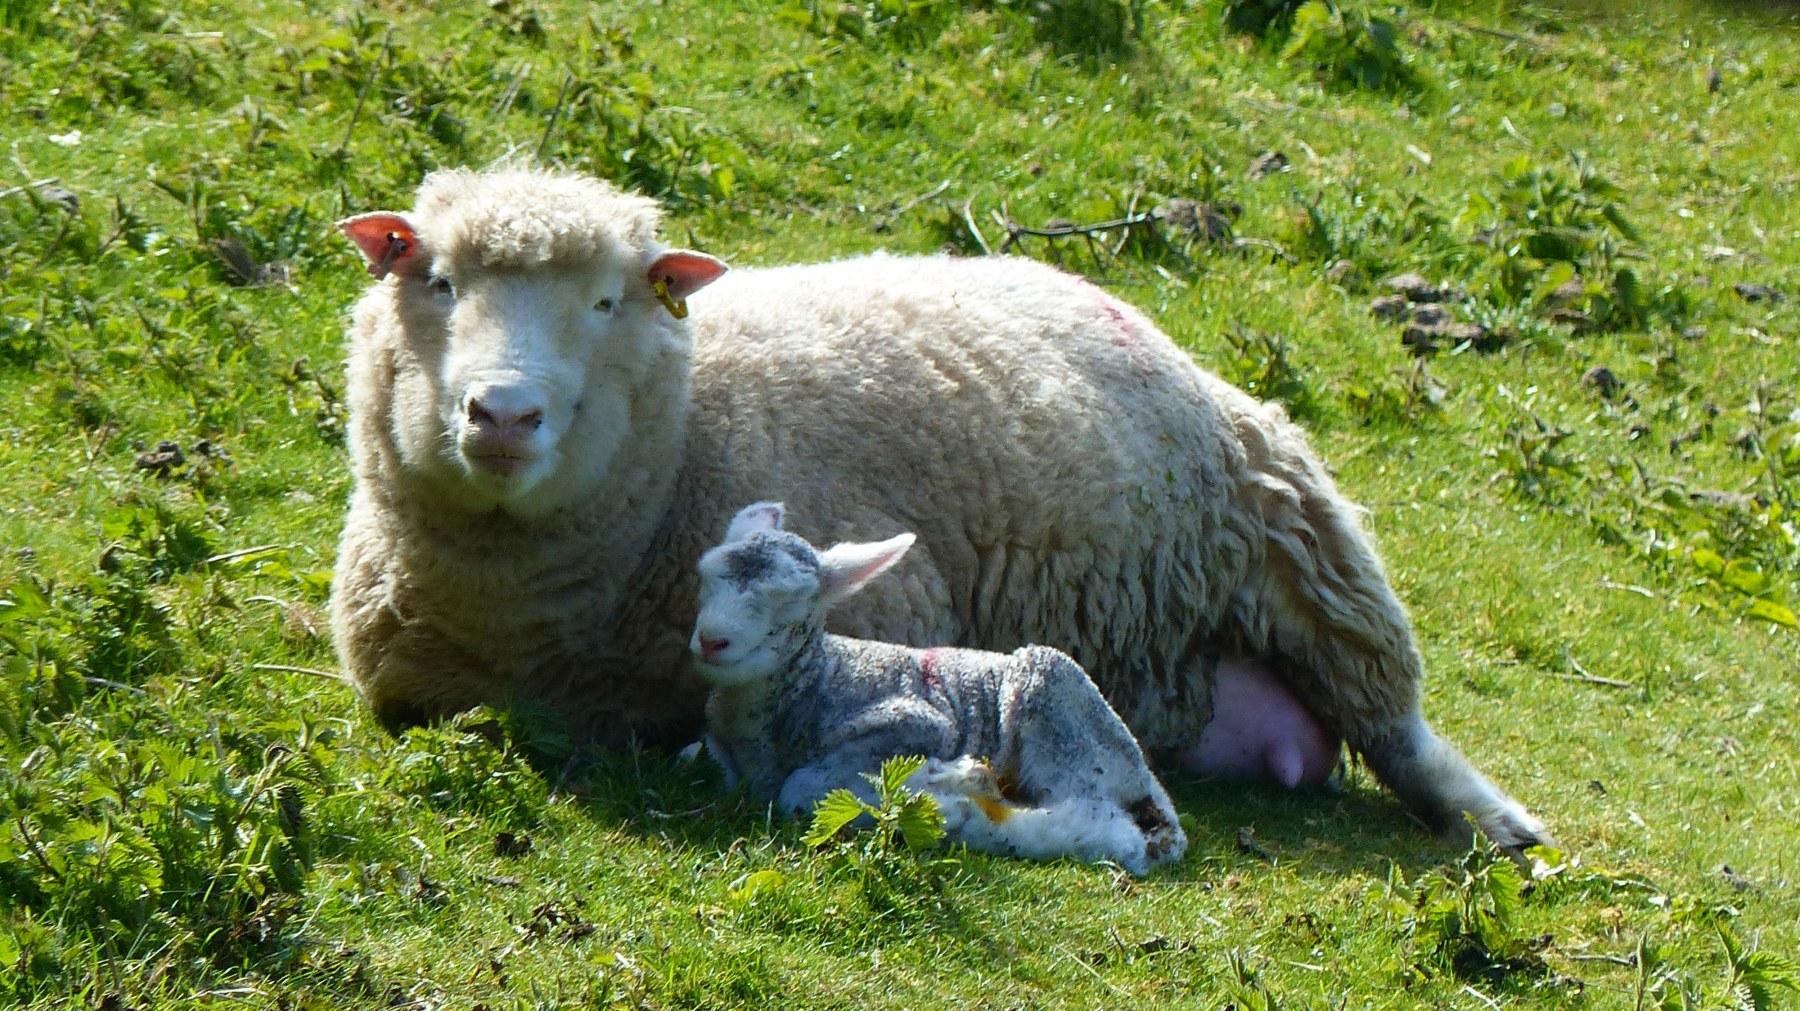 New lamb with mum